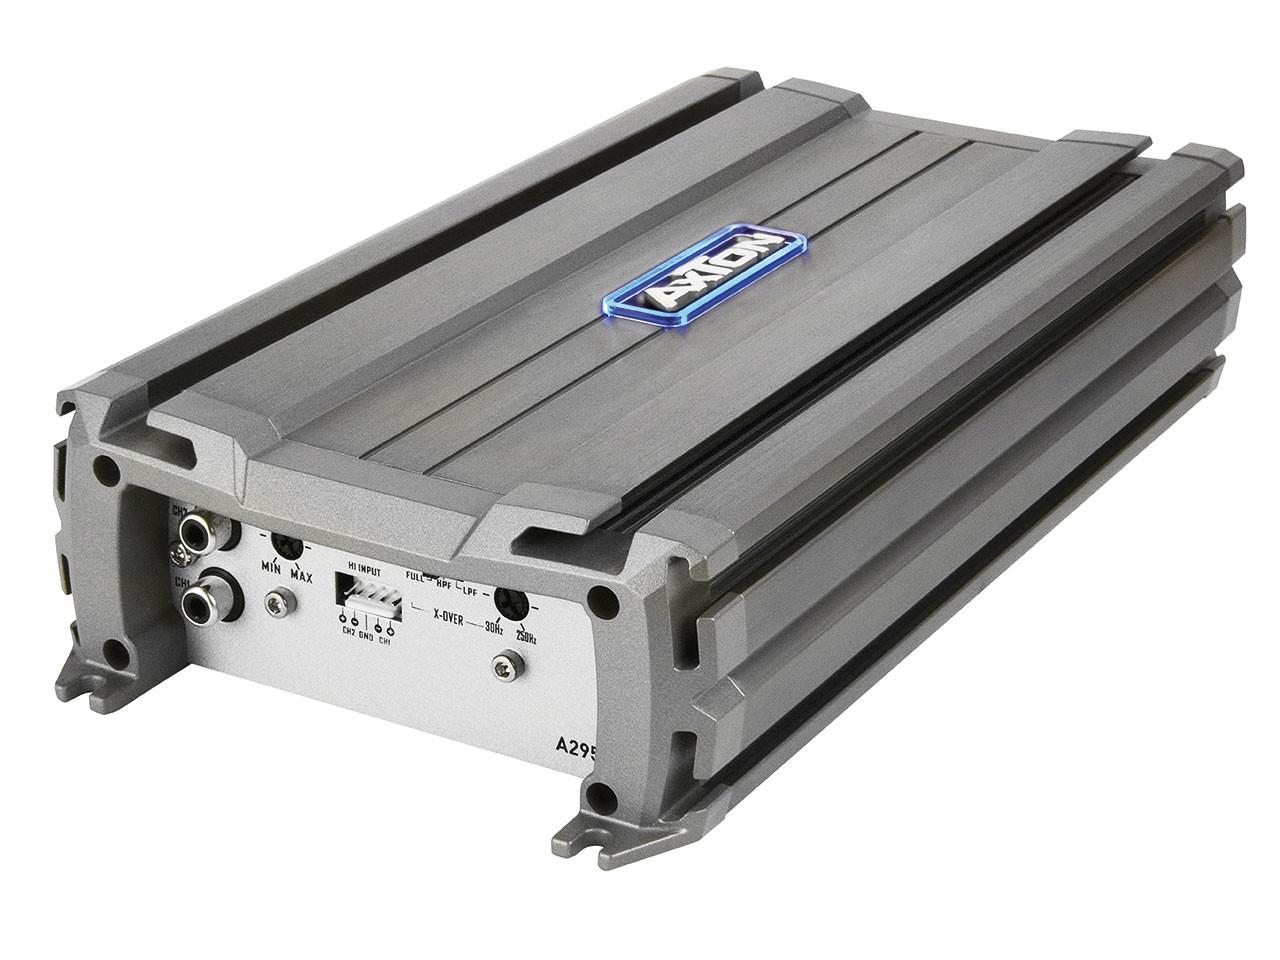 A295 - AXTON Amplifier 2 x 105 Watt